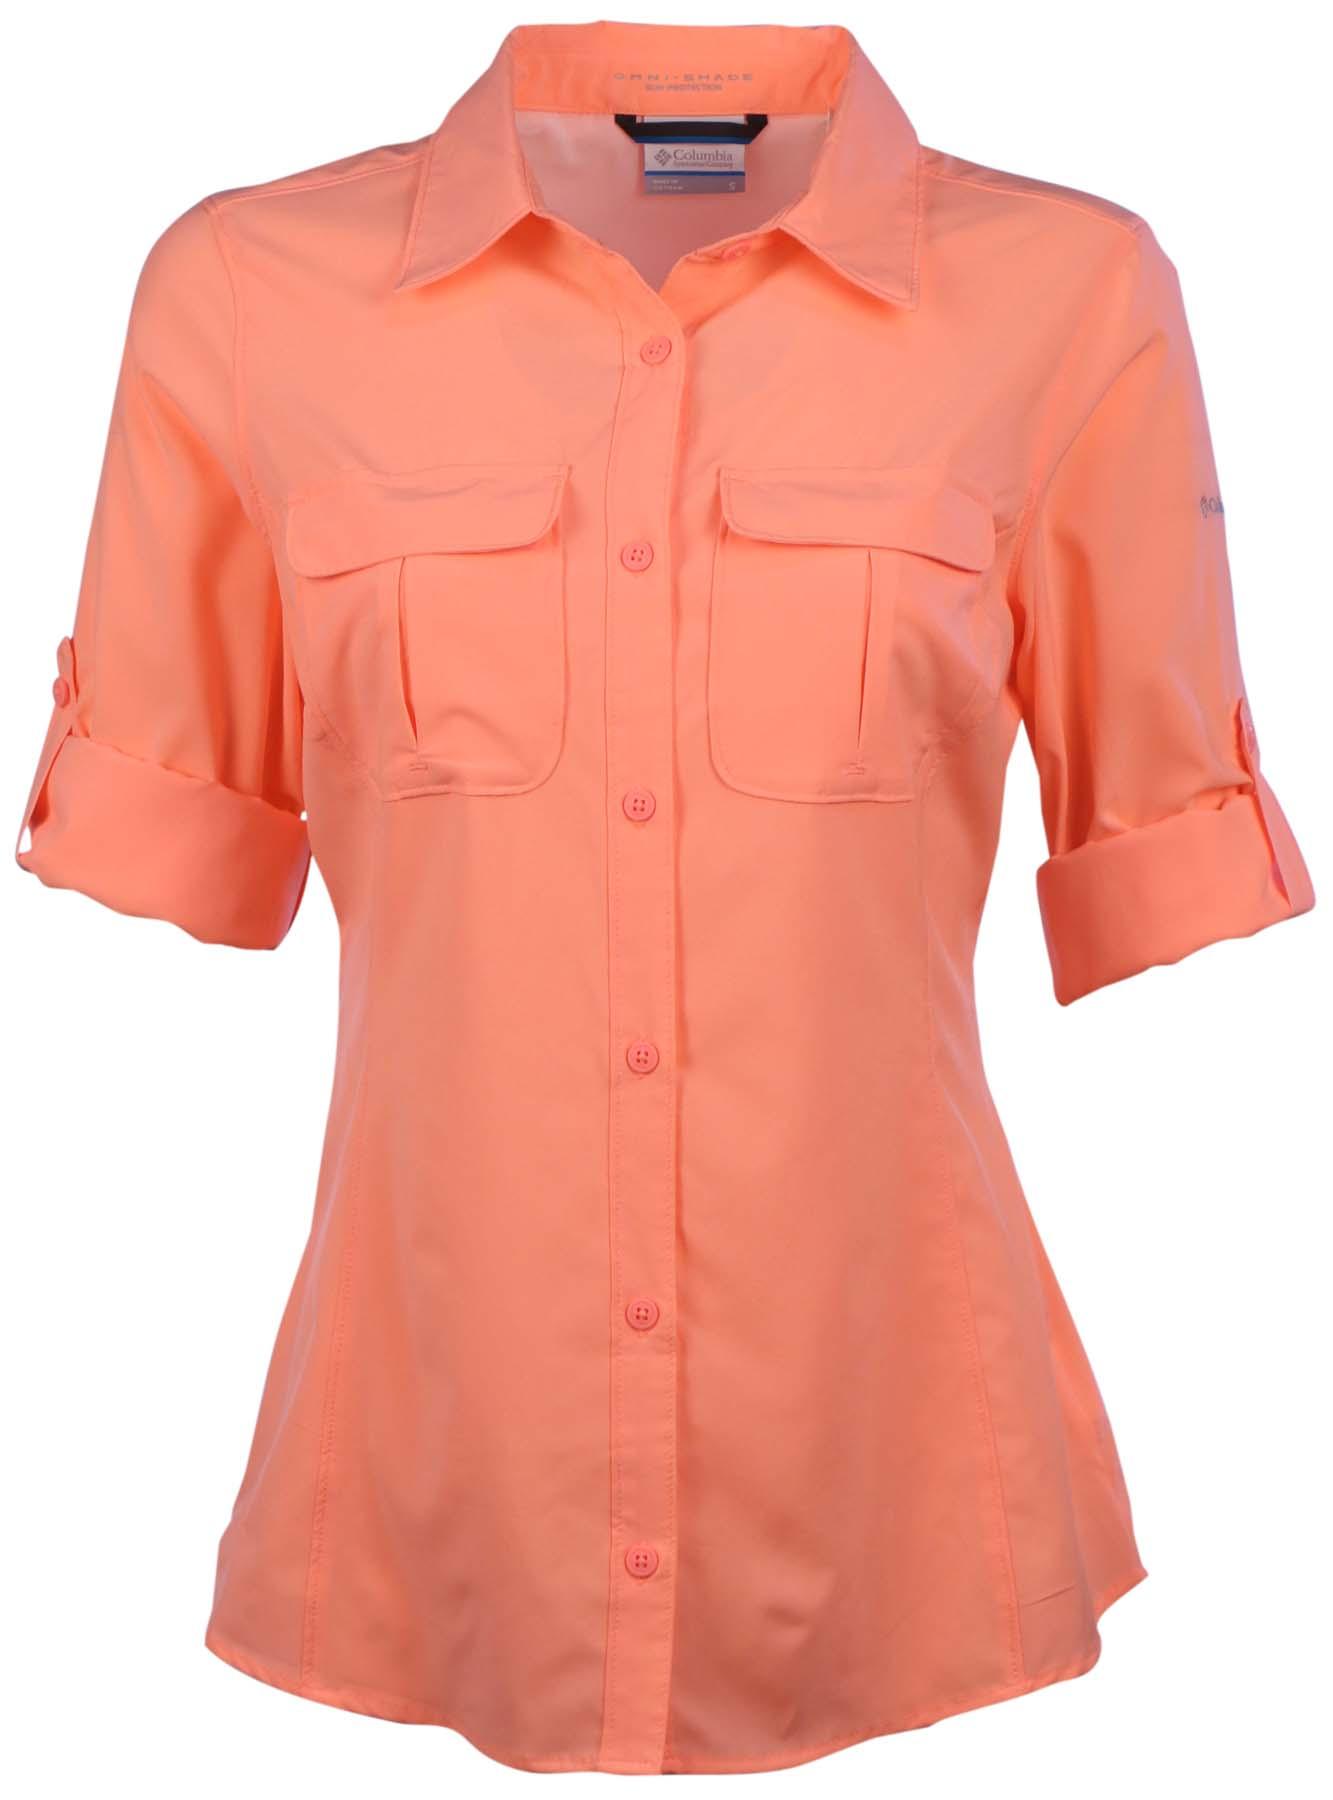 Womens Columbia Fishing Shirt